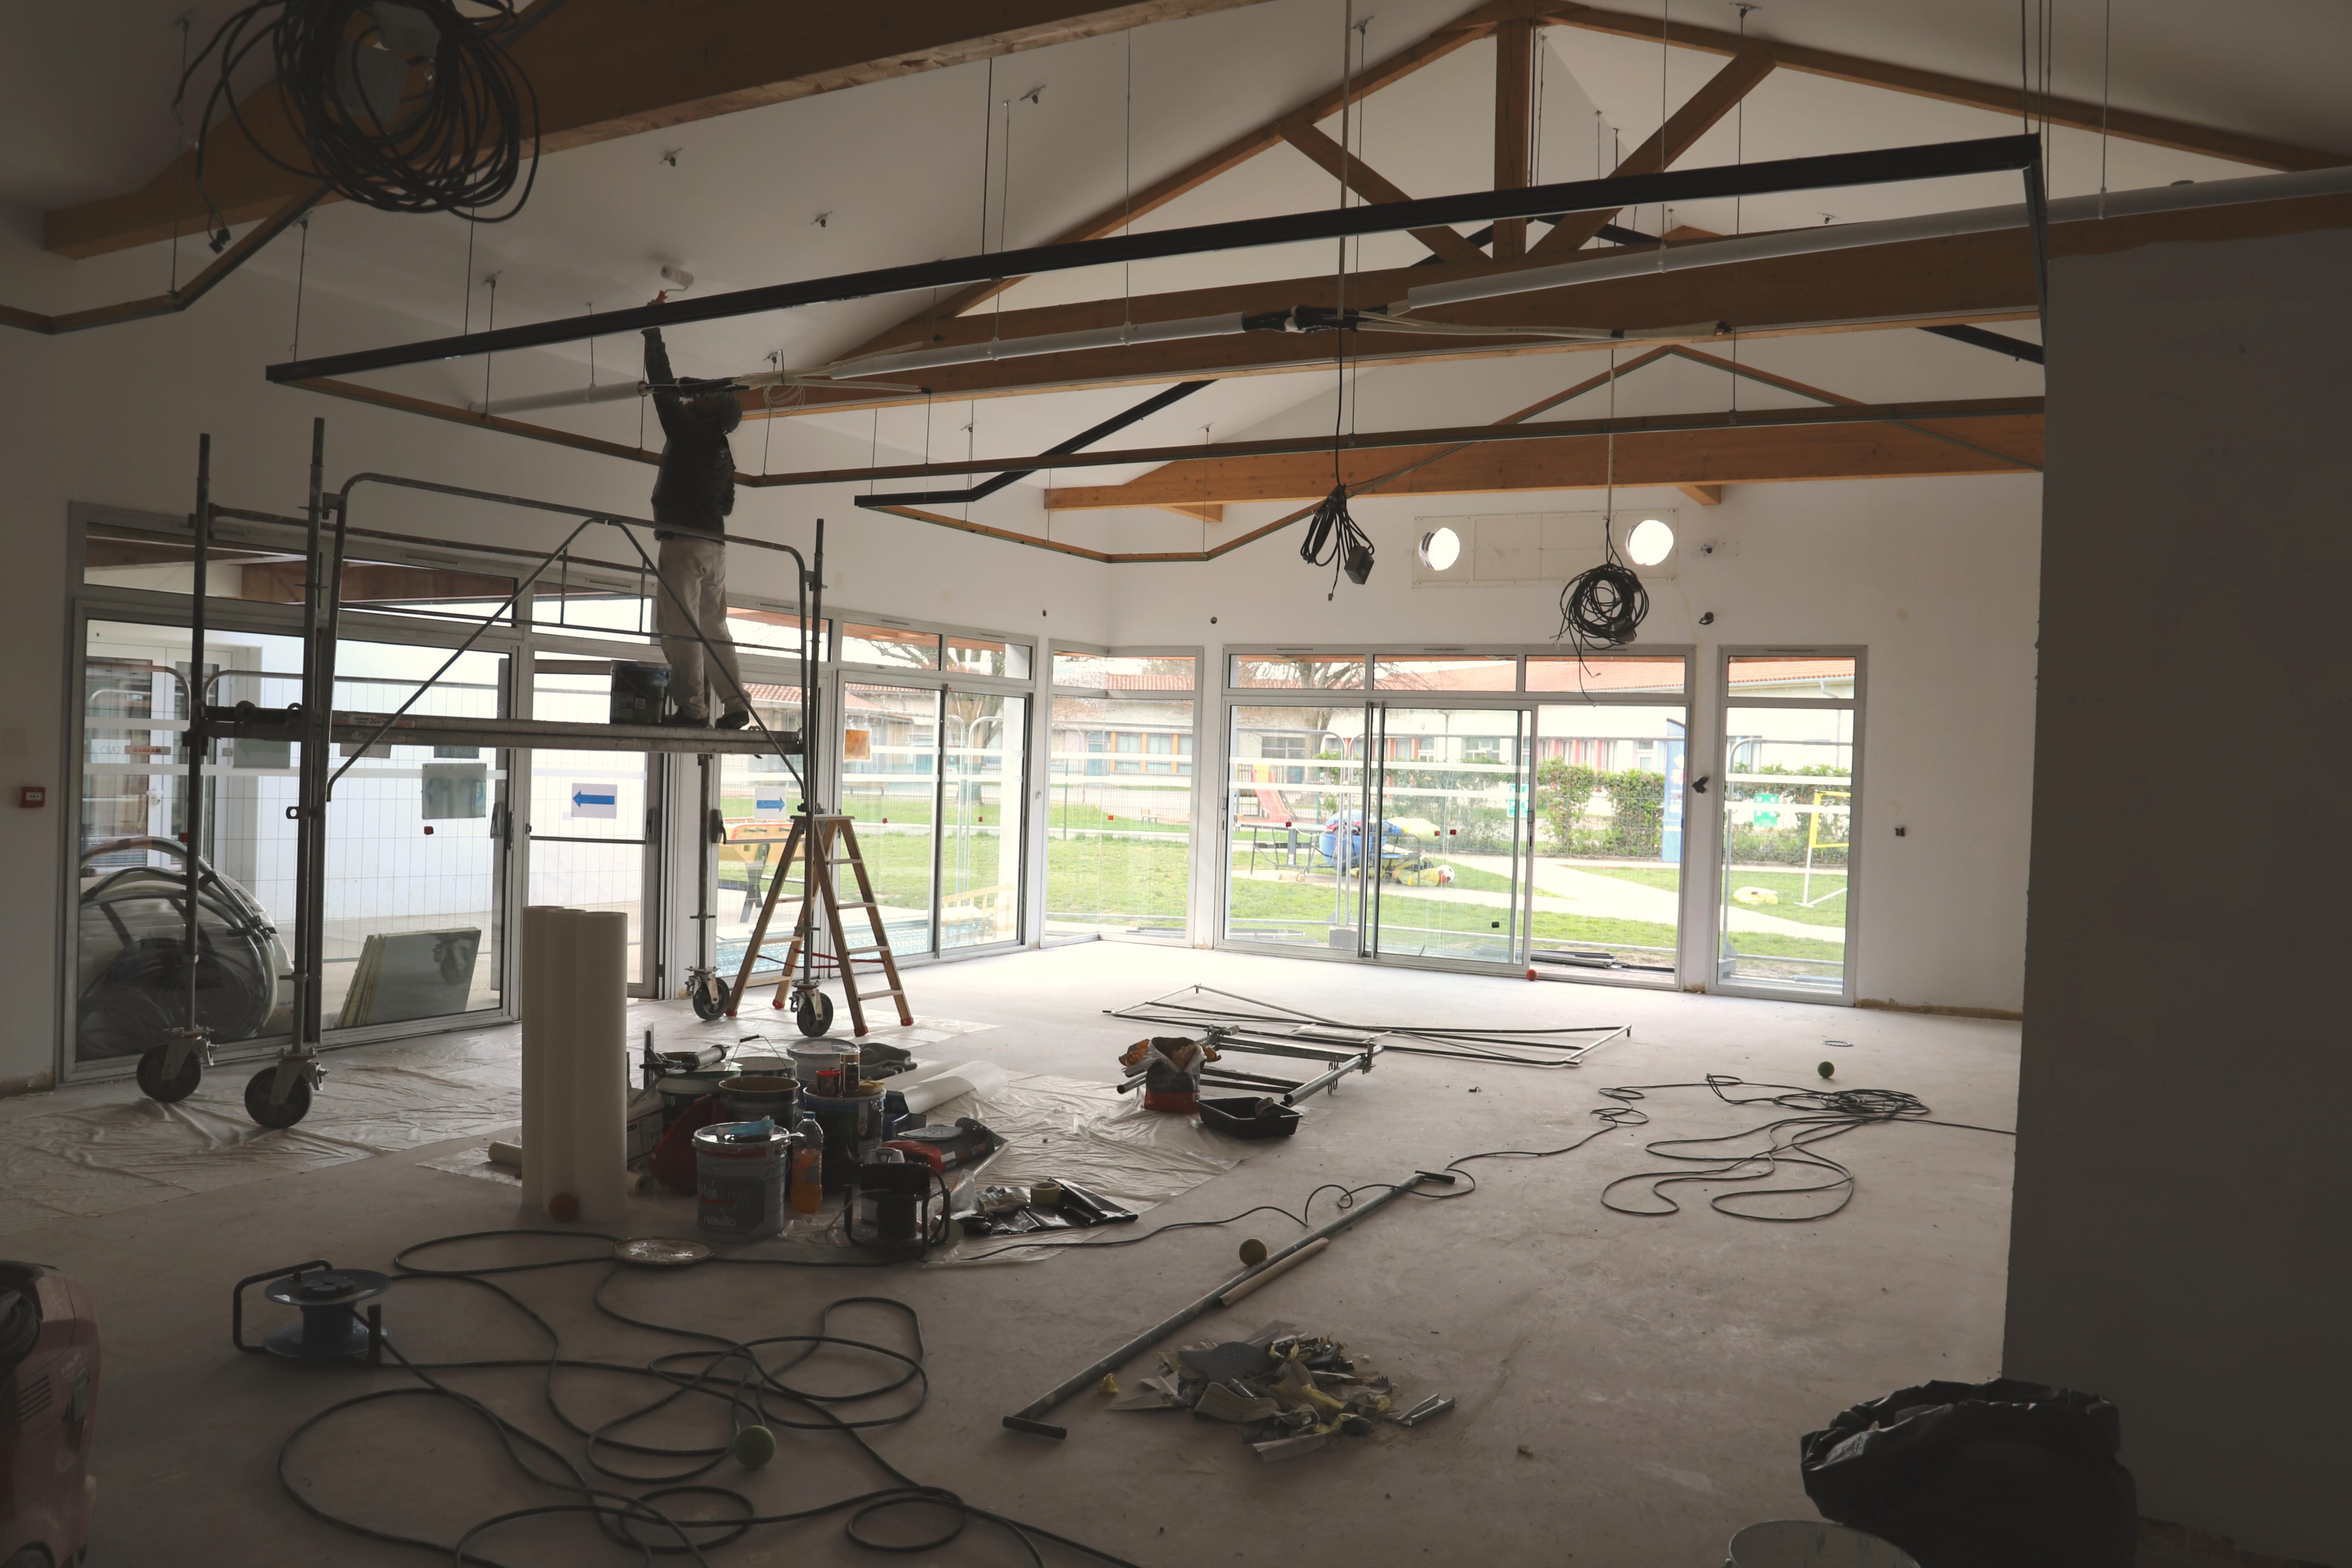 2021_02 rénovation salle d_activité 4.JPG